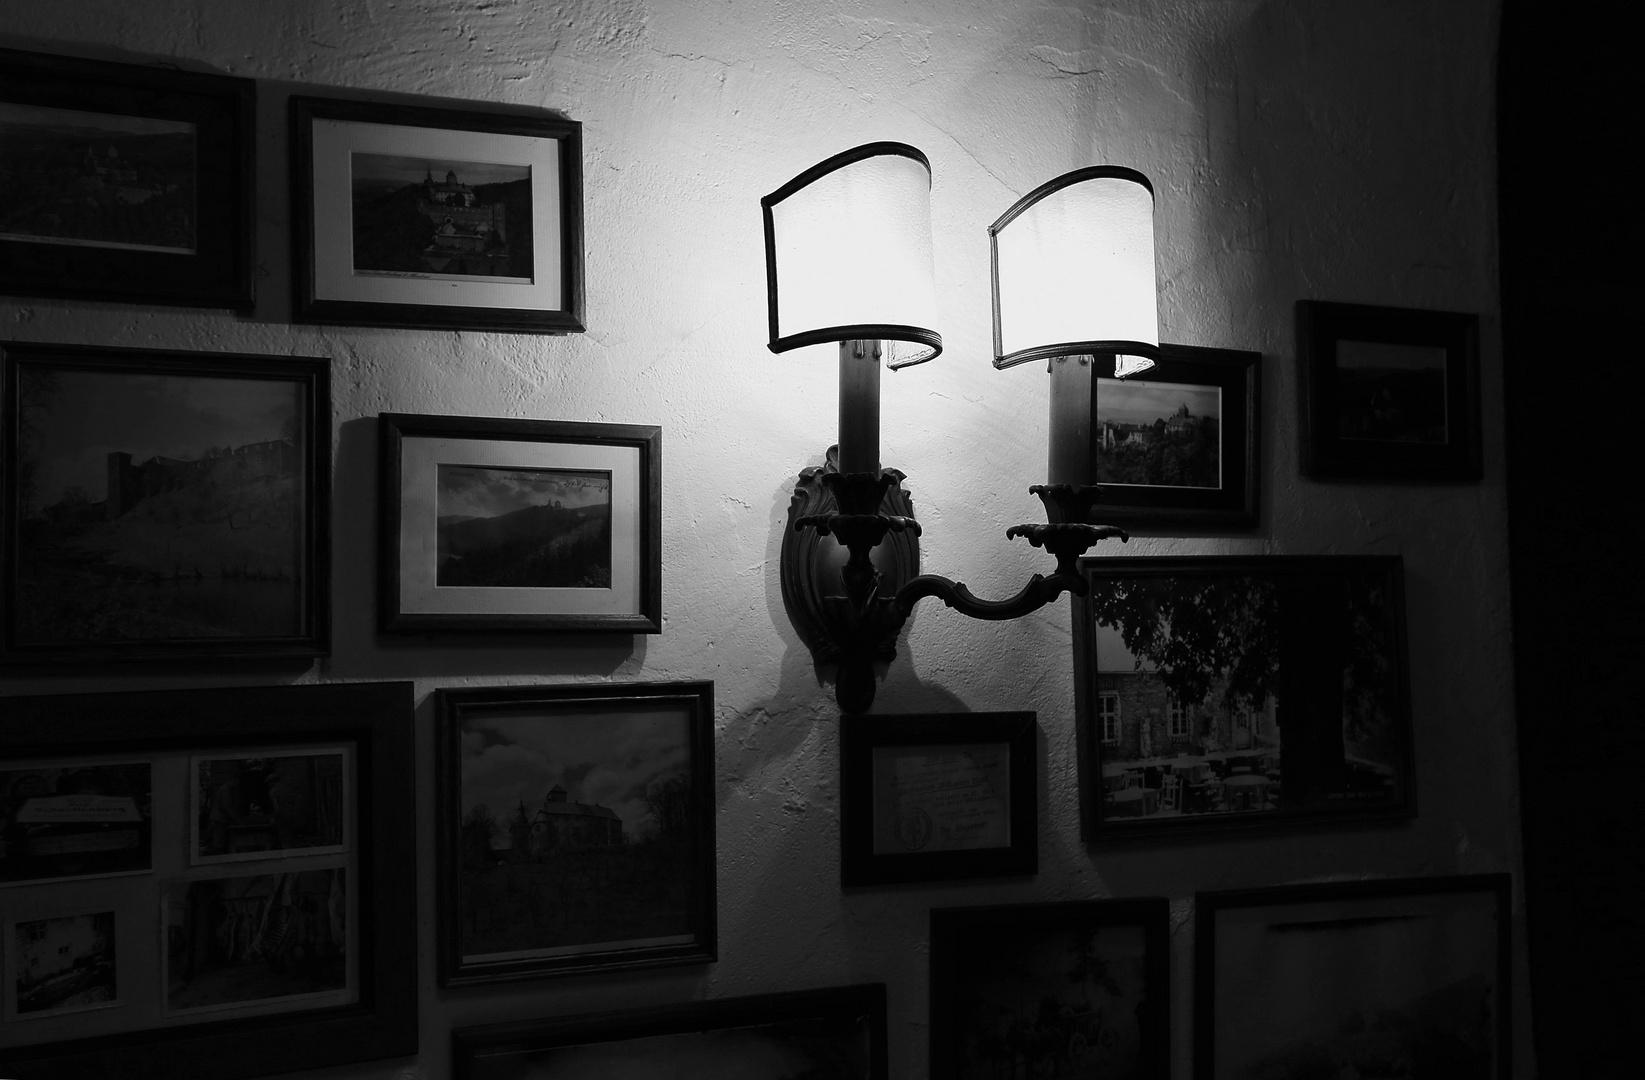 Gallerie